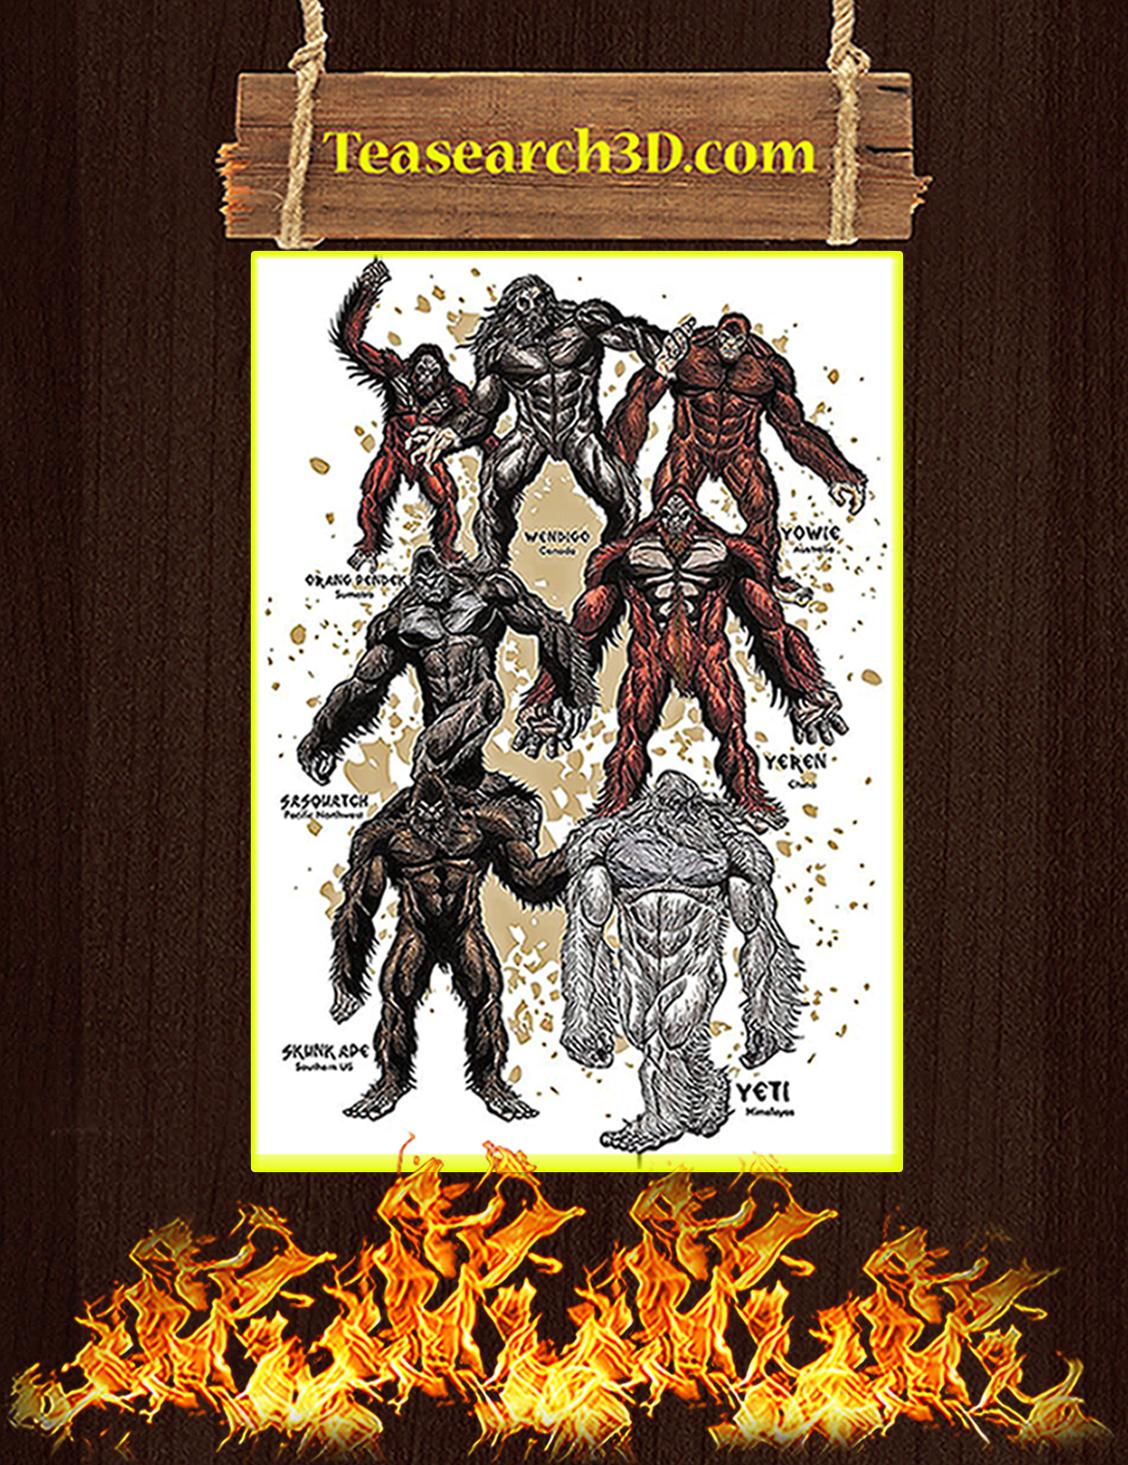 Bigfoot orang pendek wendigo yowie poster A3